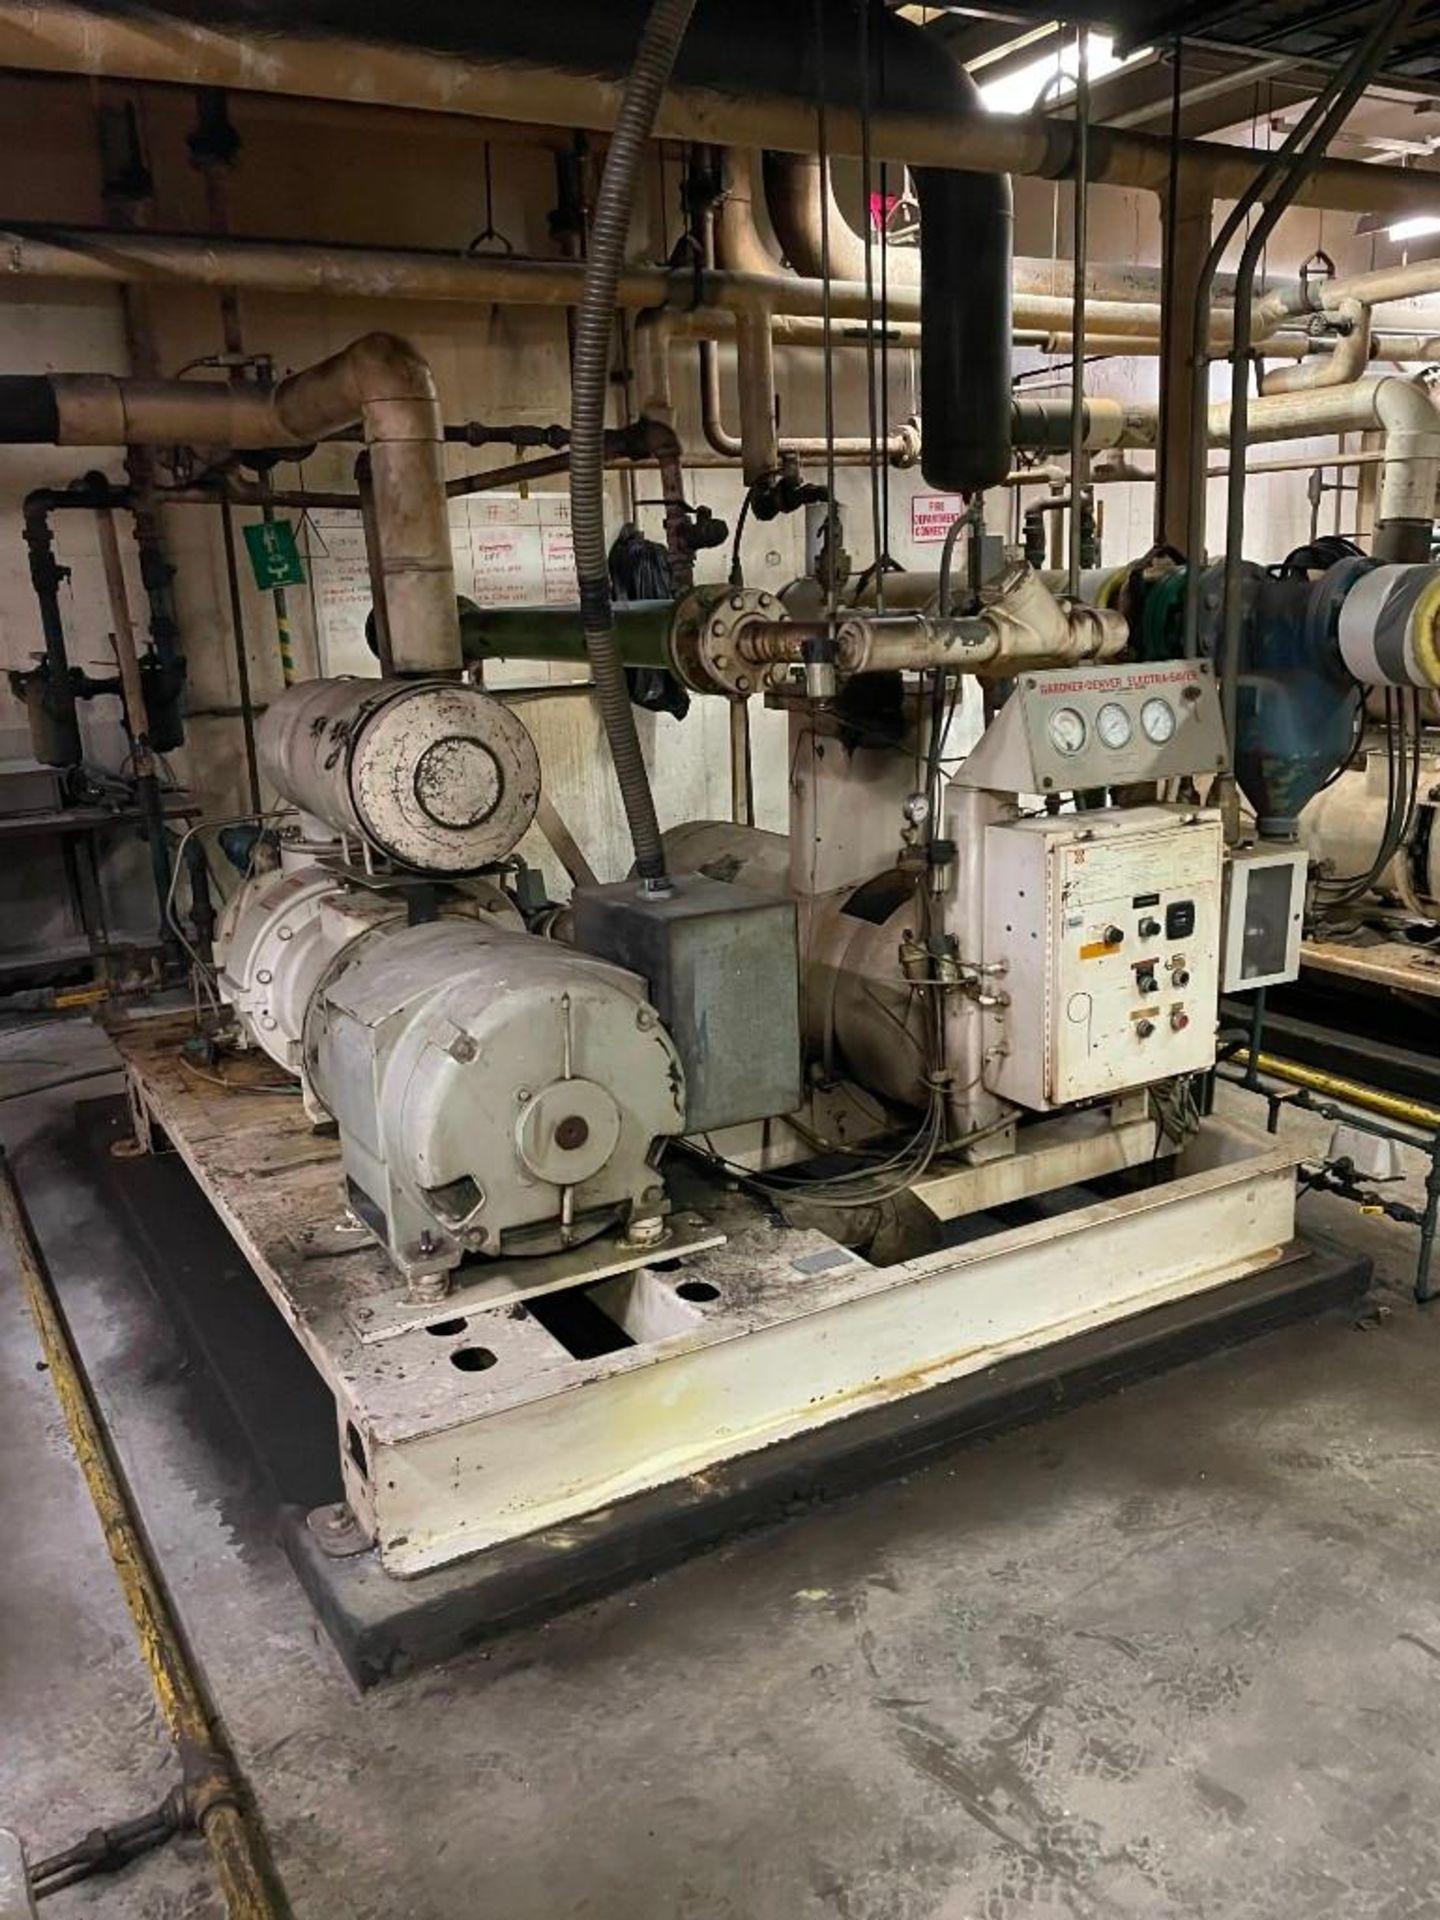 Gardner Denver 200 Horsepower Air Compressor - Image 2 of 6